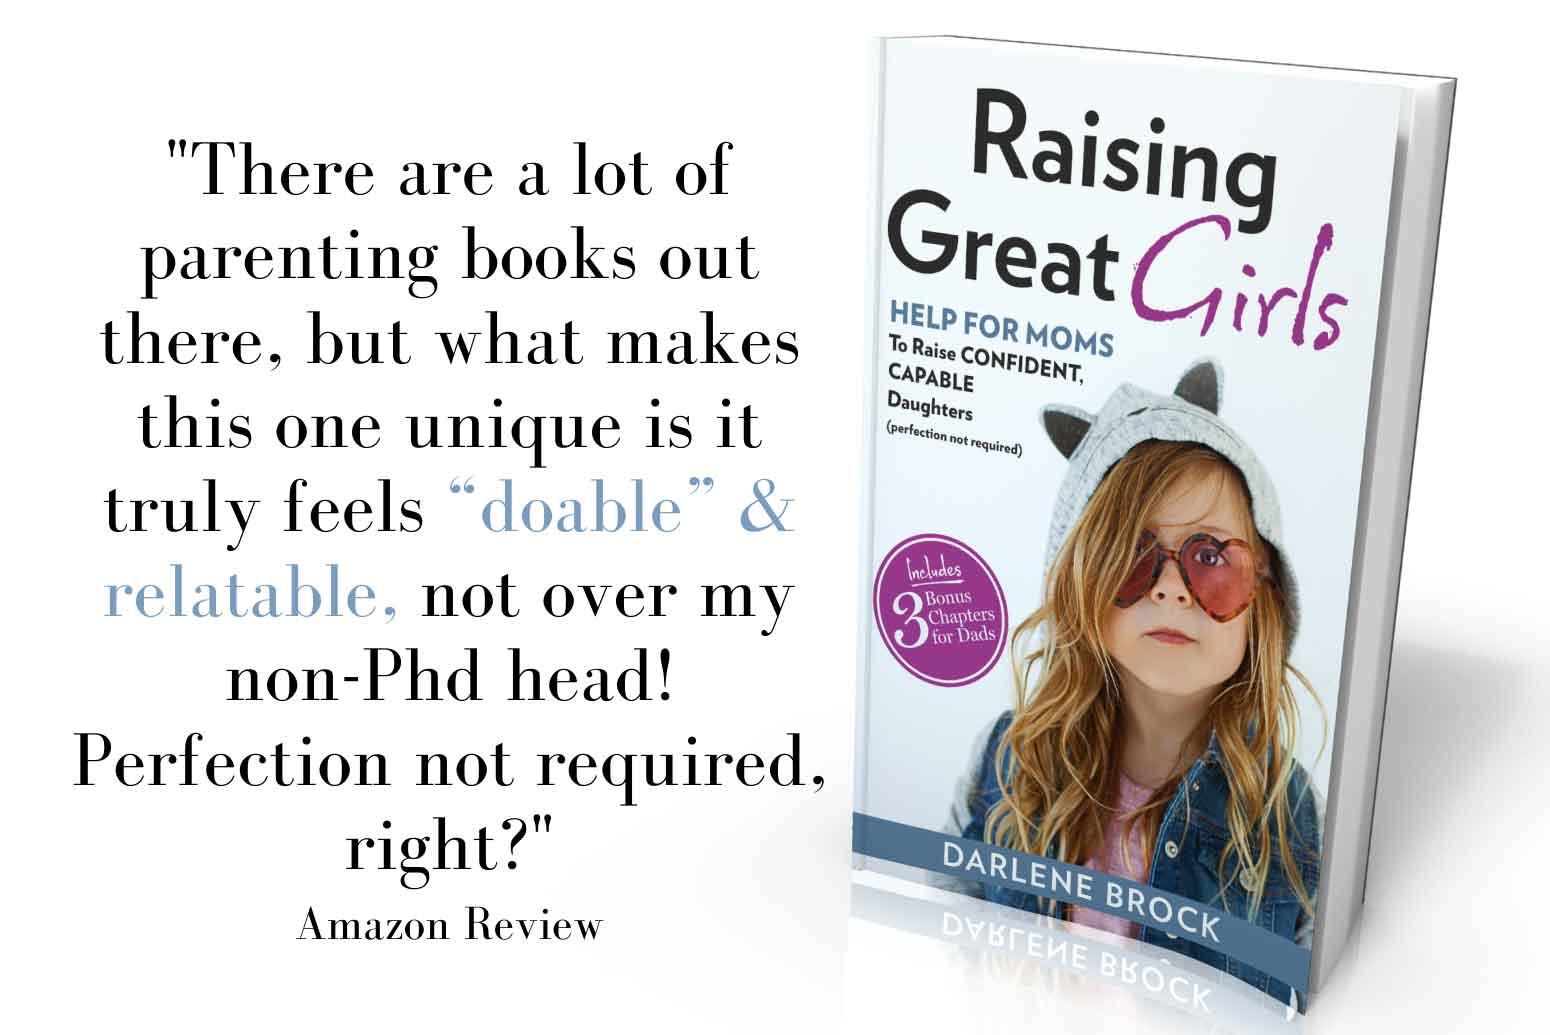 Raising Great Girls Interview